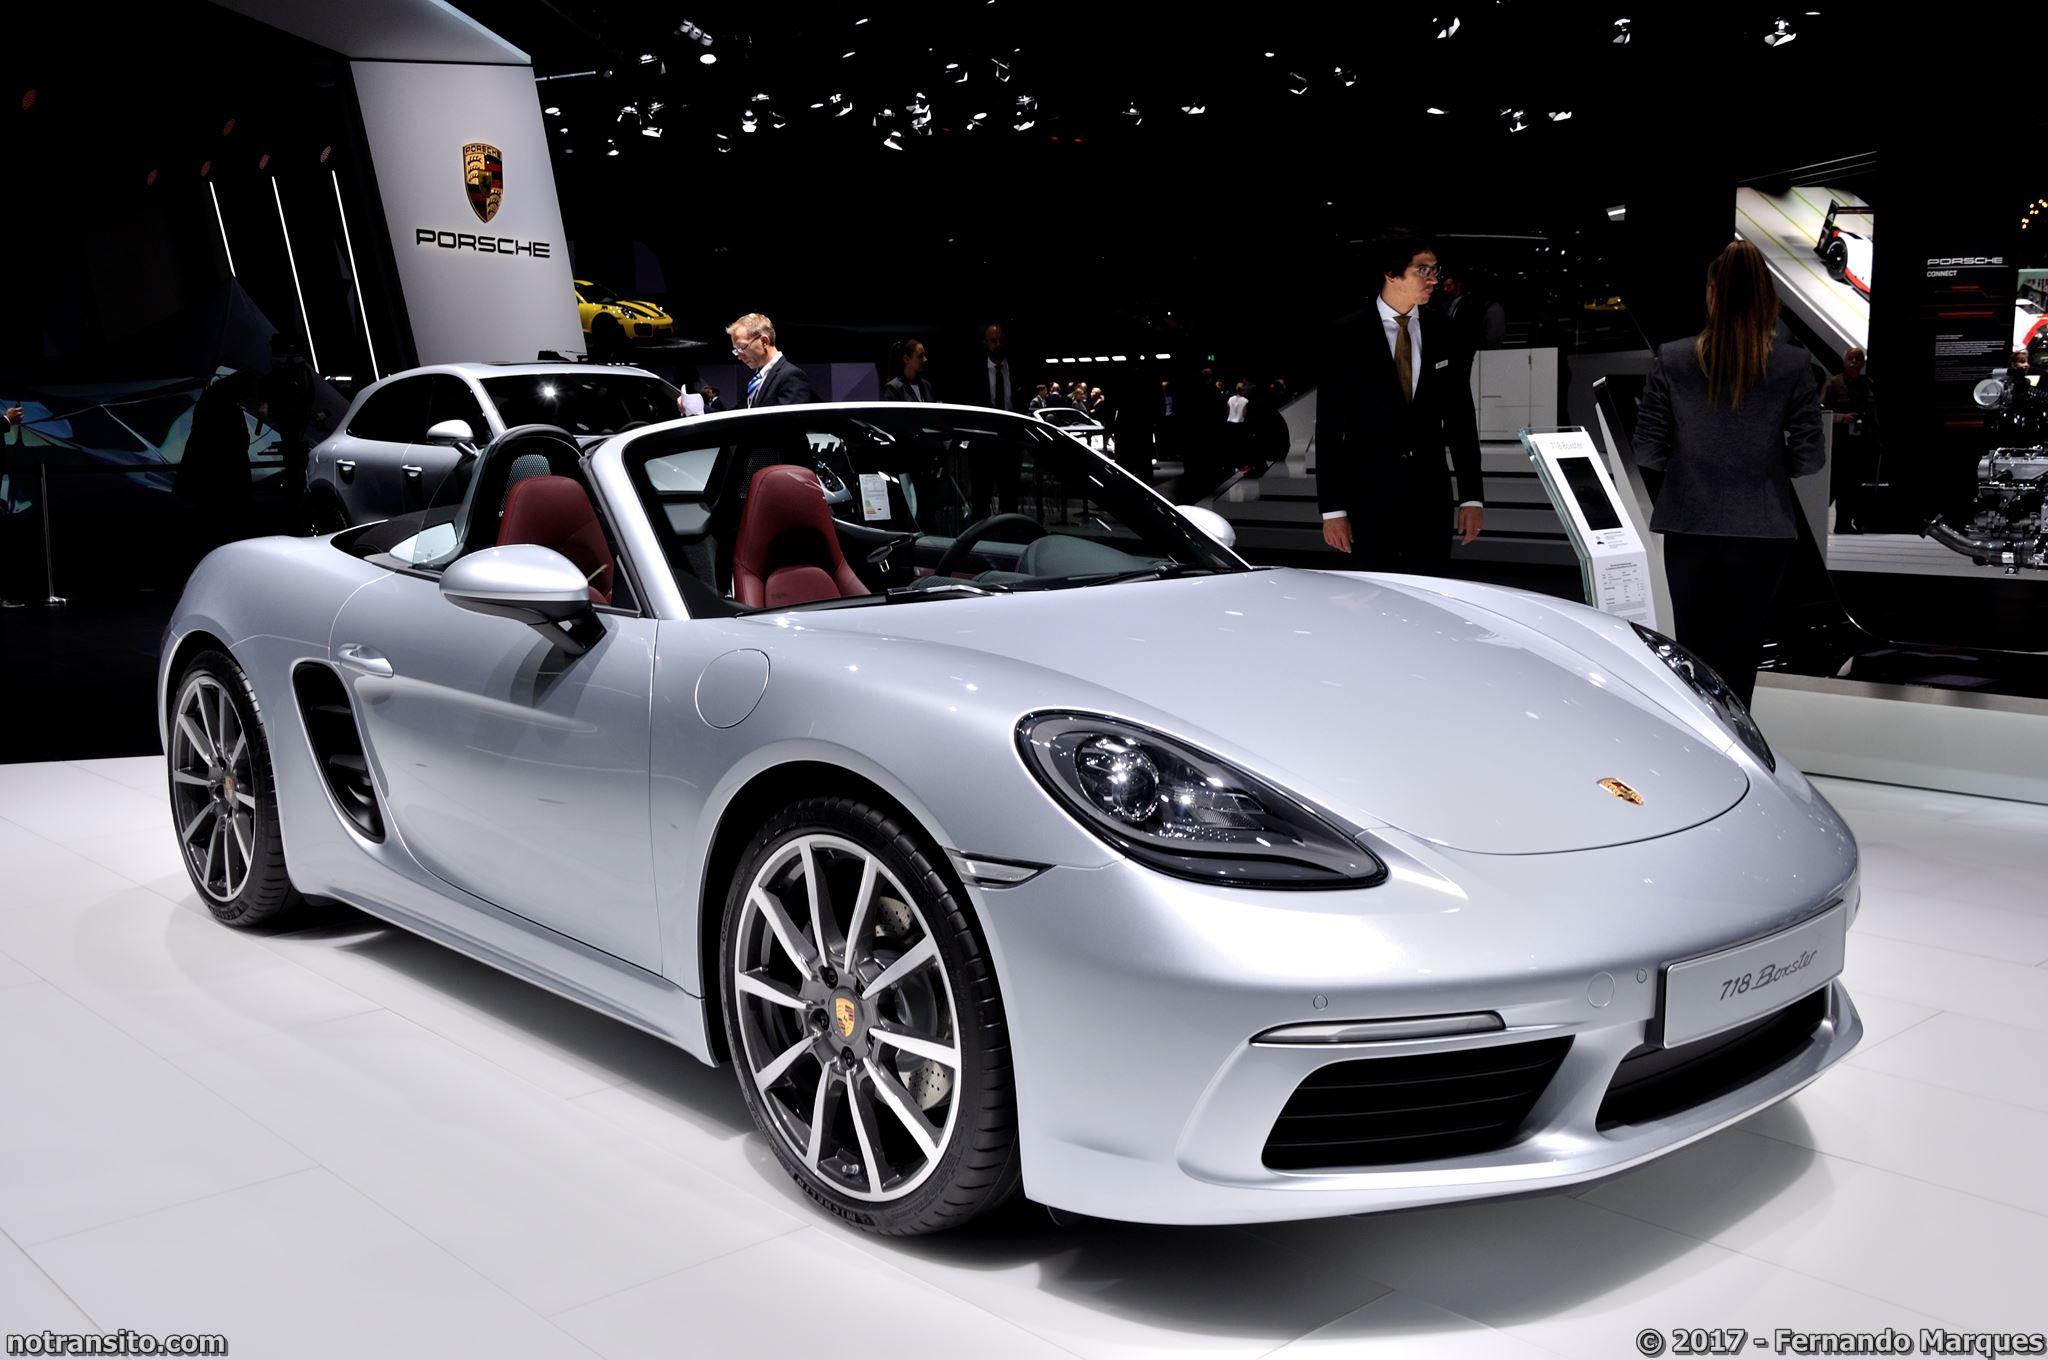 Porsche-Boxster-Frankfurt-2017-002